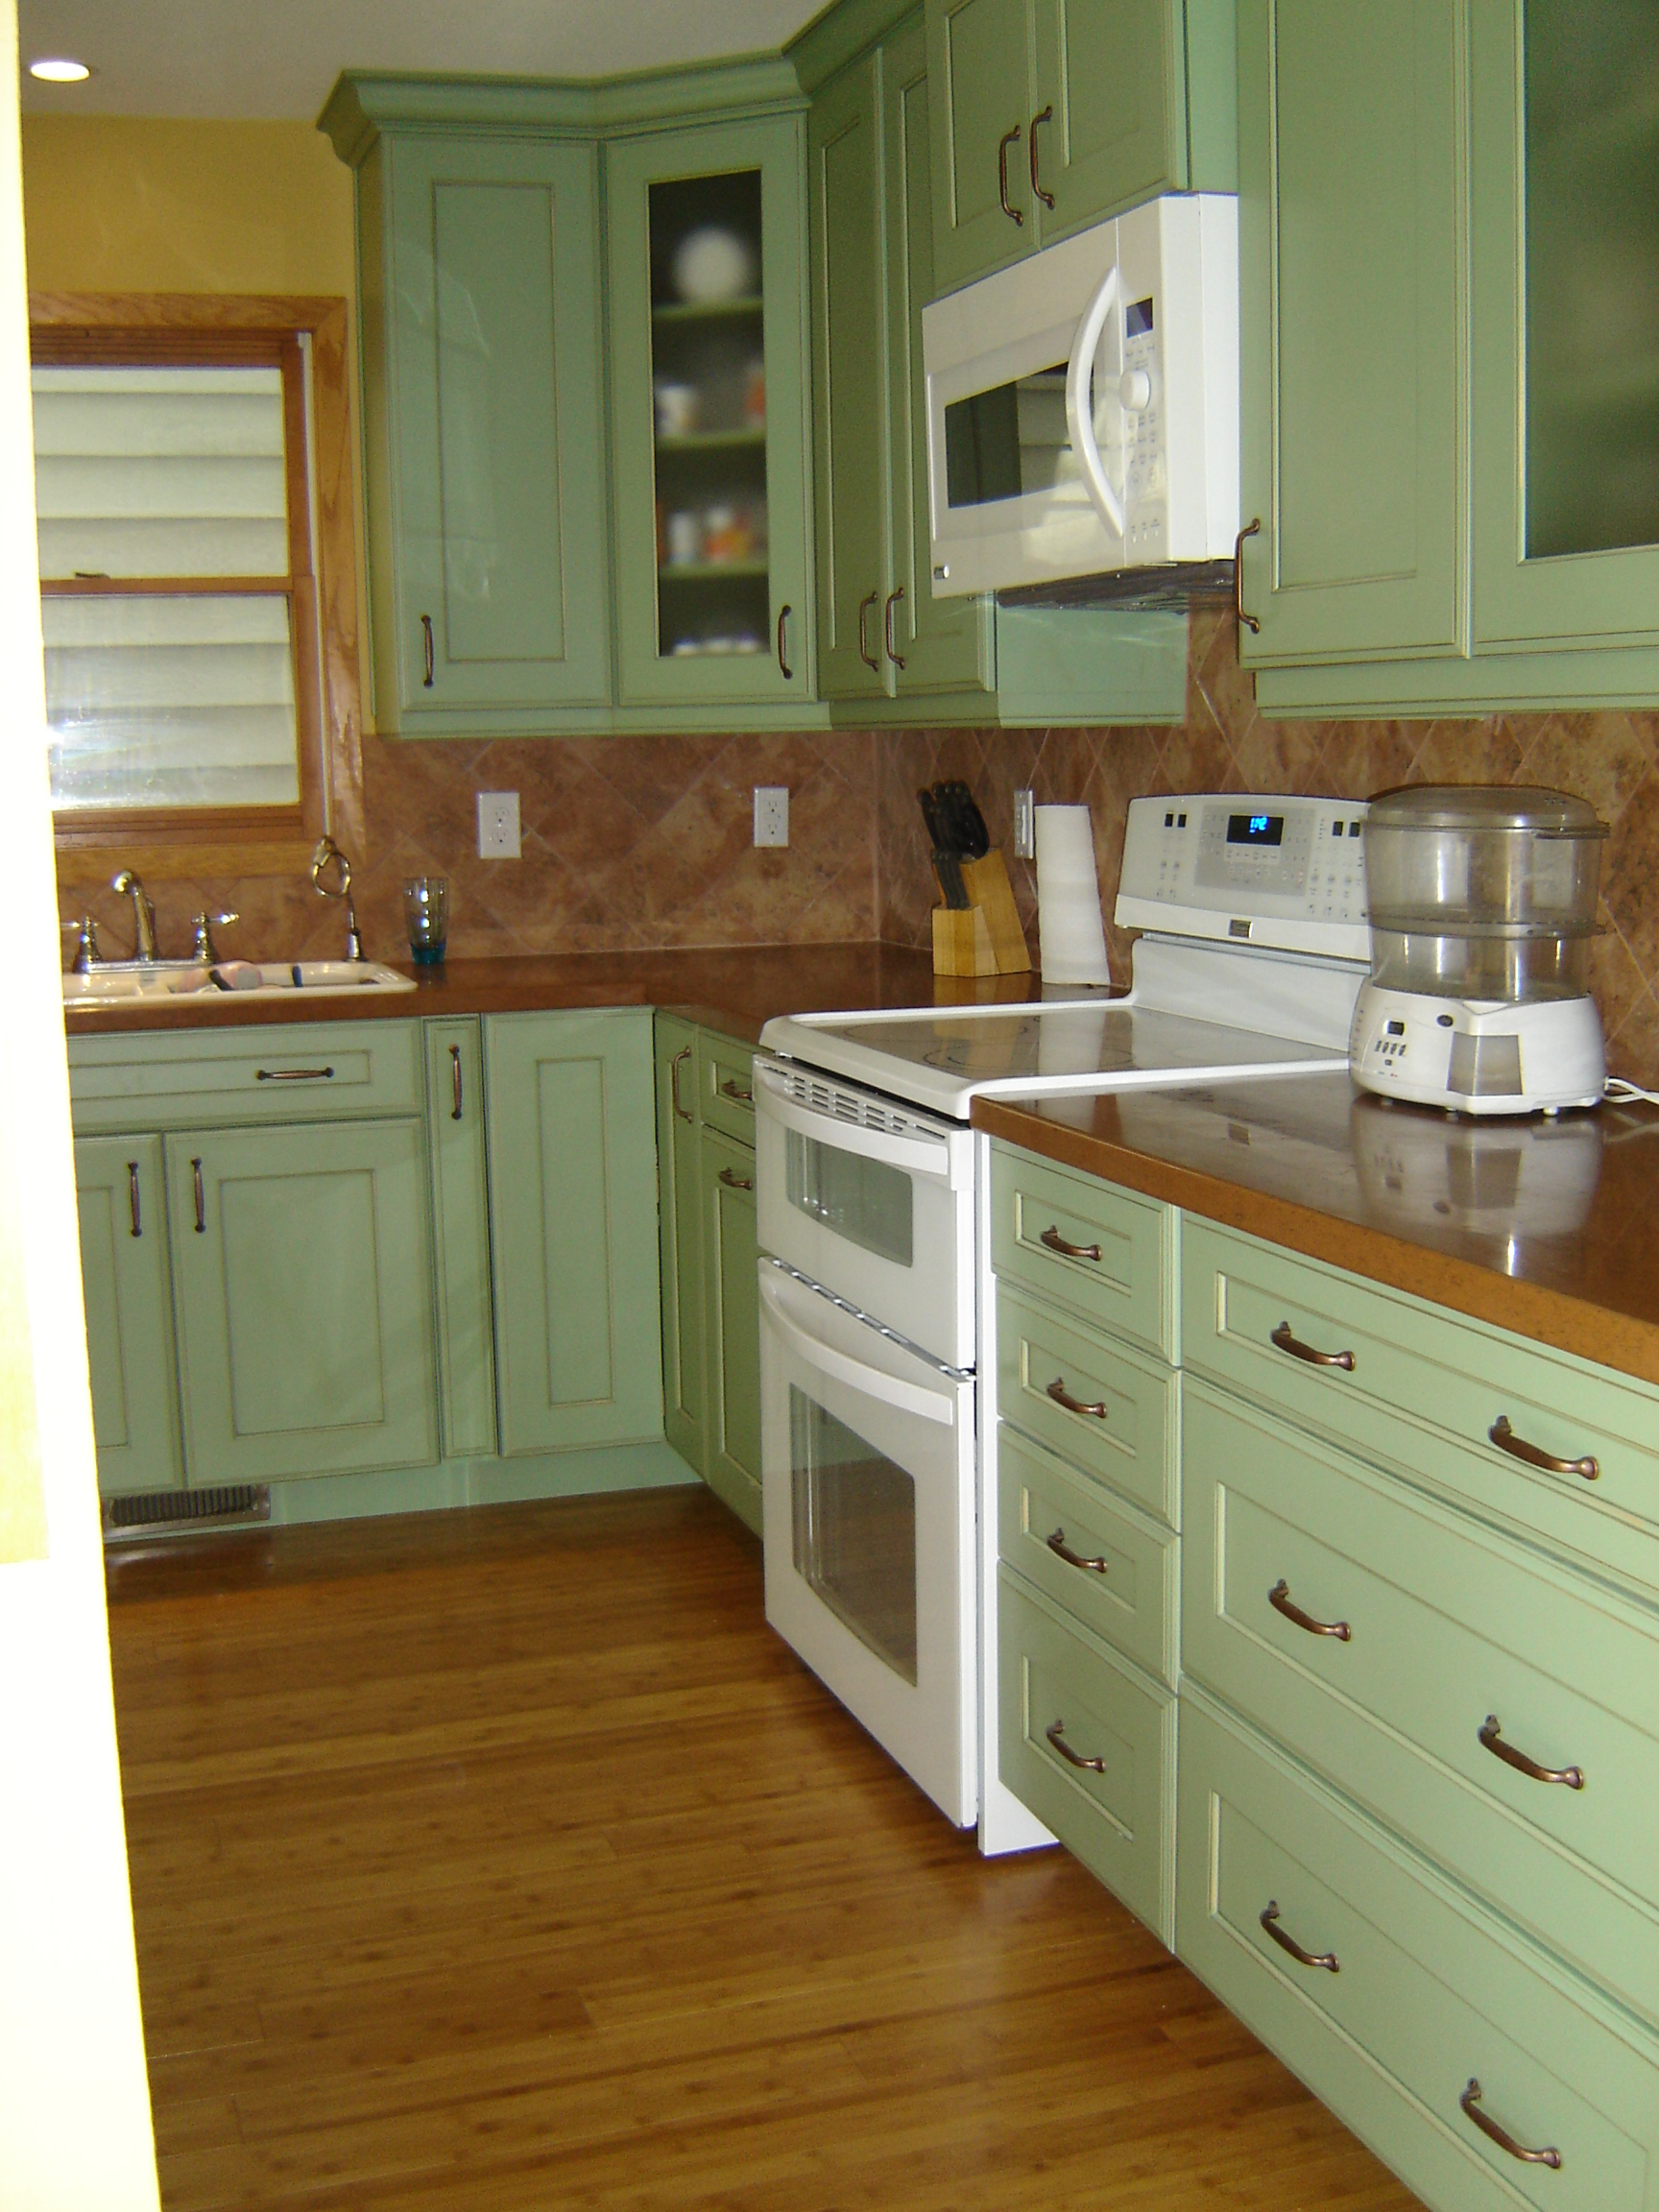 residential kitchen remodeling lincoln ne Martin Daniel Kitchen Remodel Boulder CO